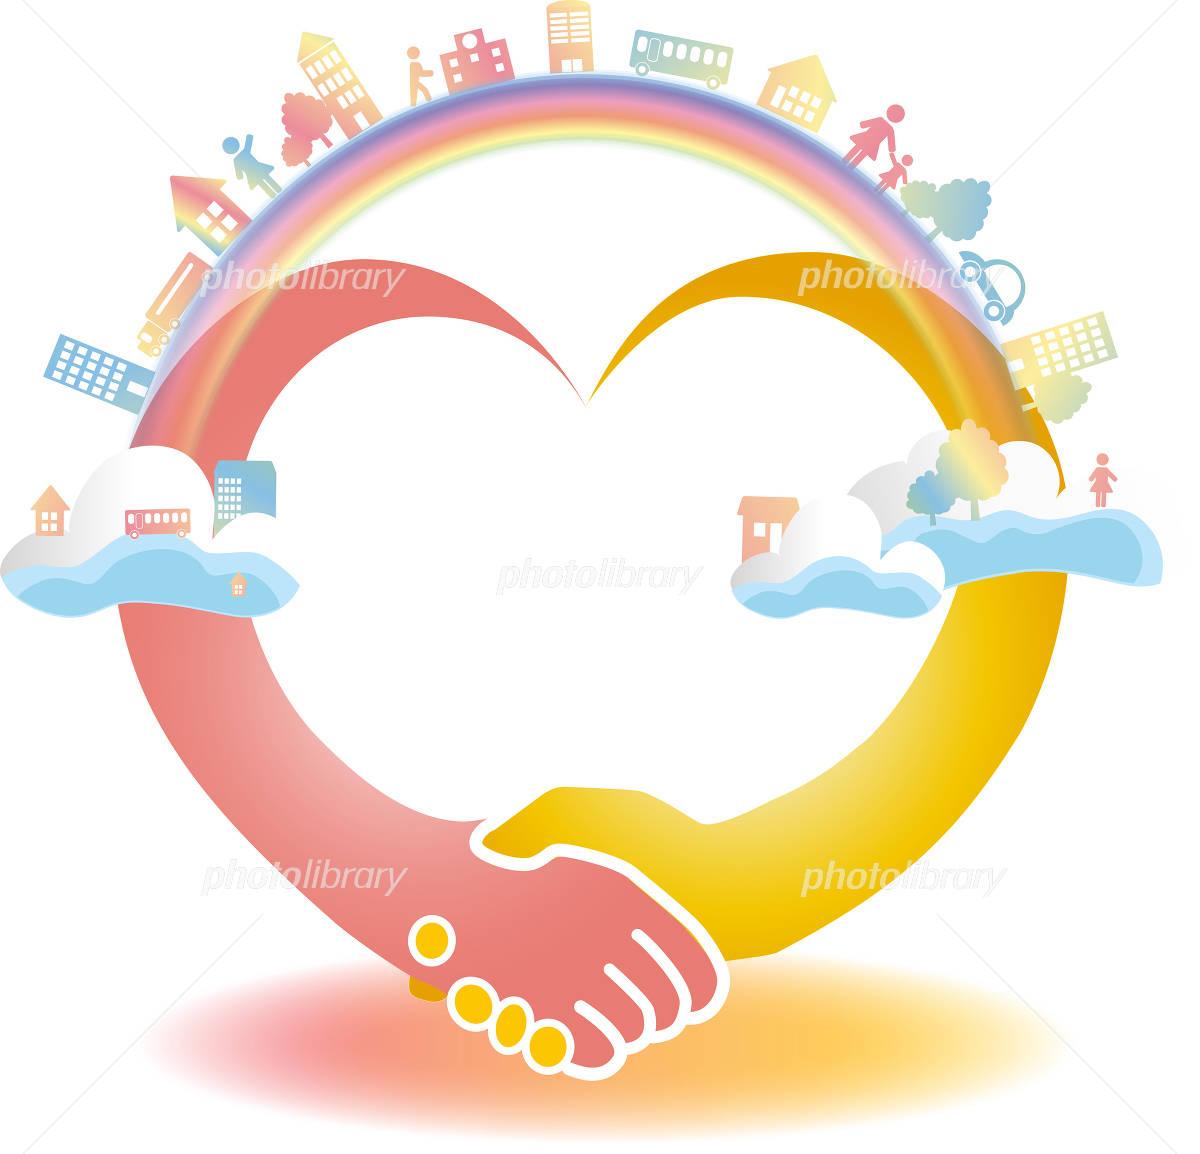 Handshake Heart イラスト素材